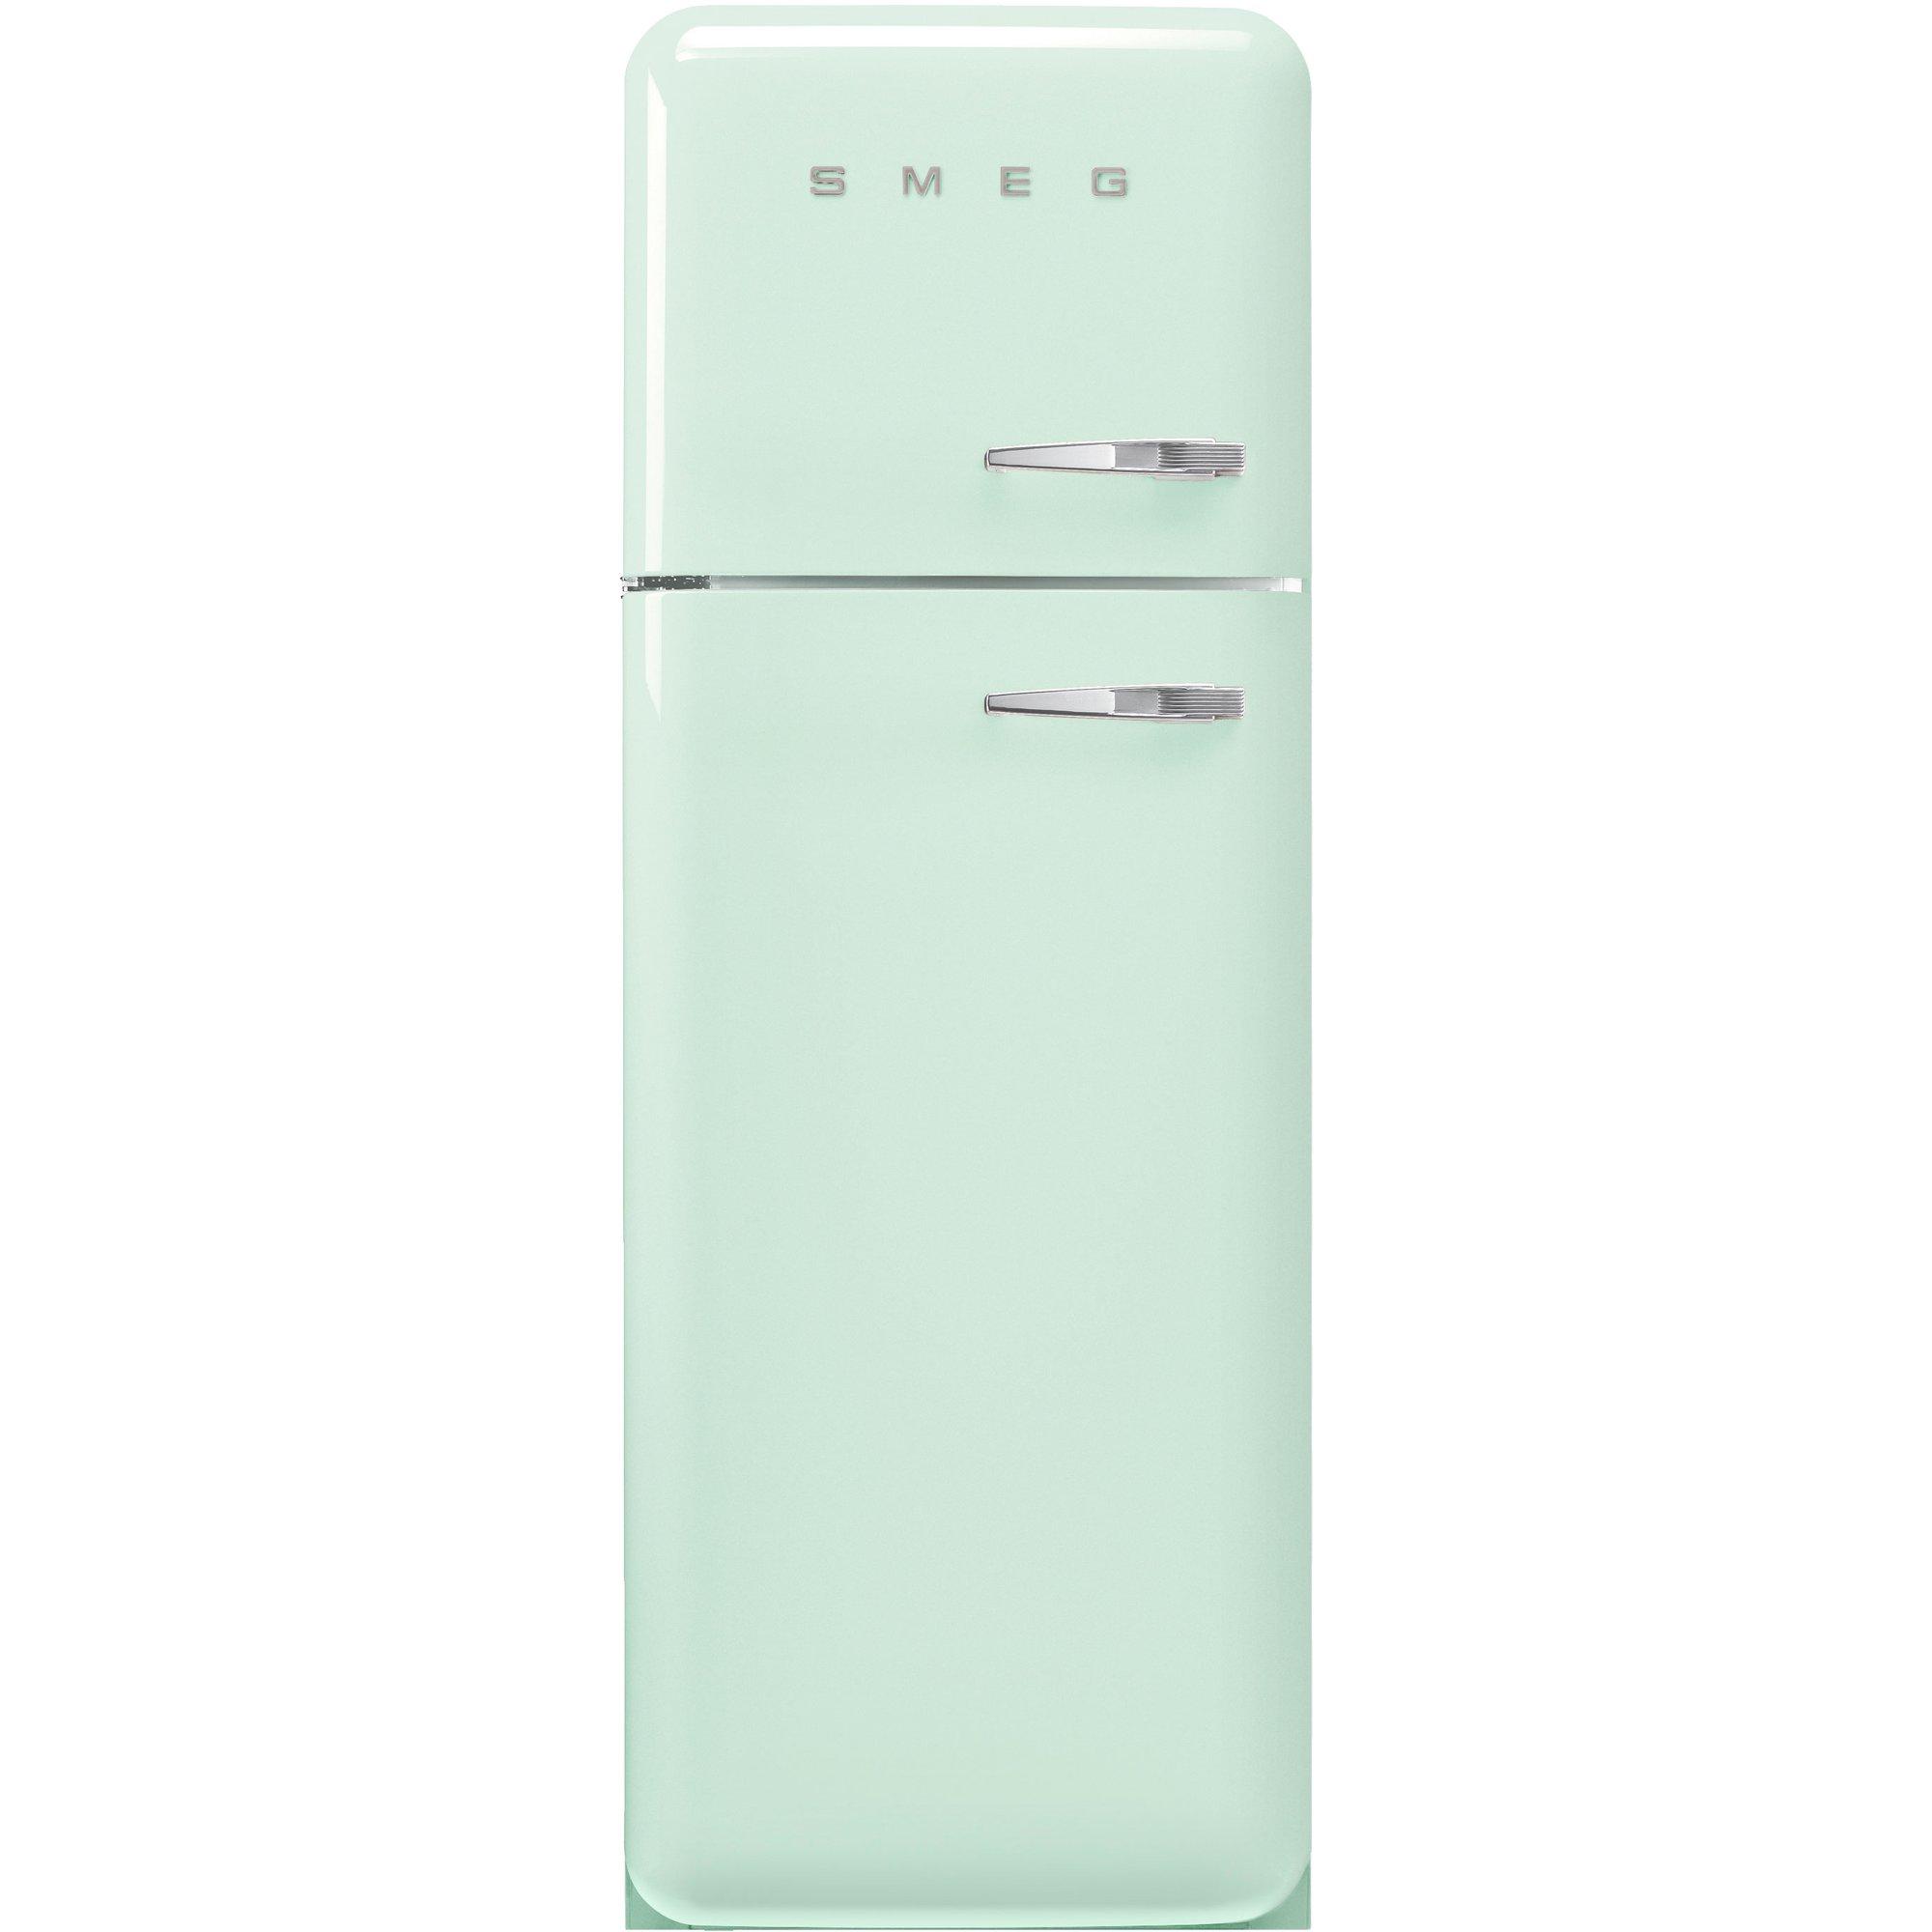 Smeg FAB30LPG5 Køle-/fryseskab pastelgrøn